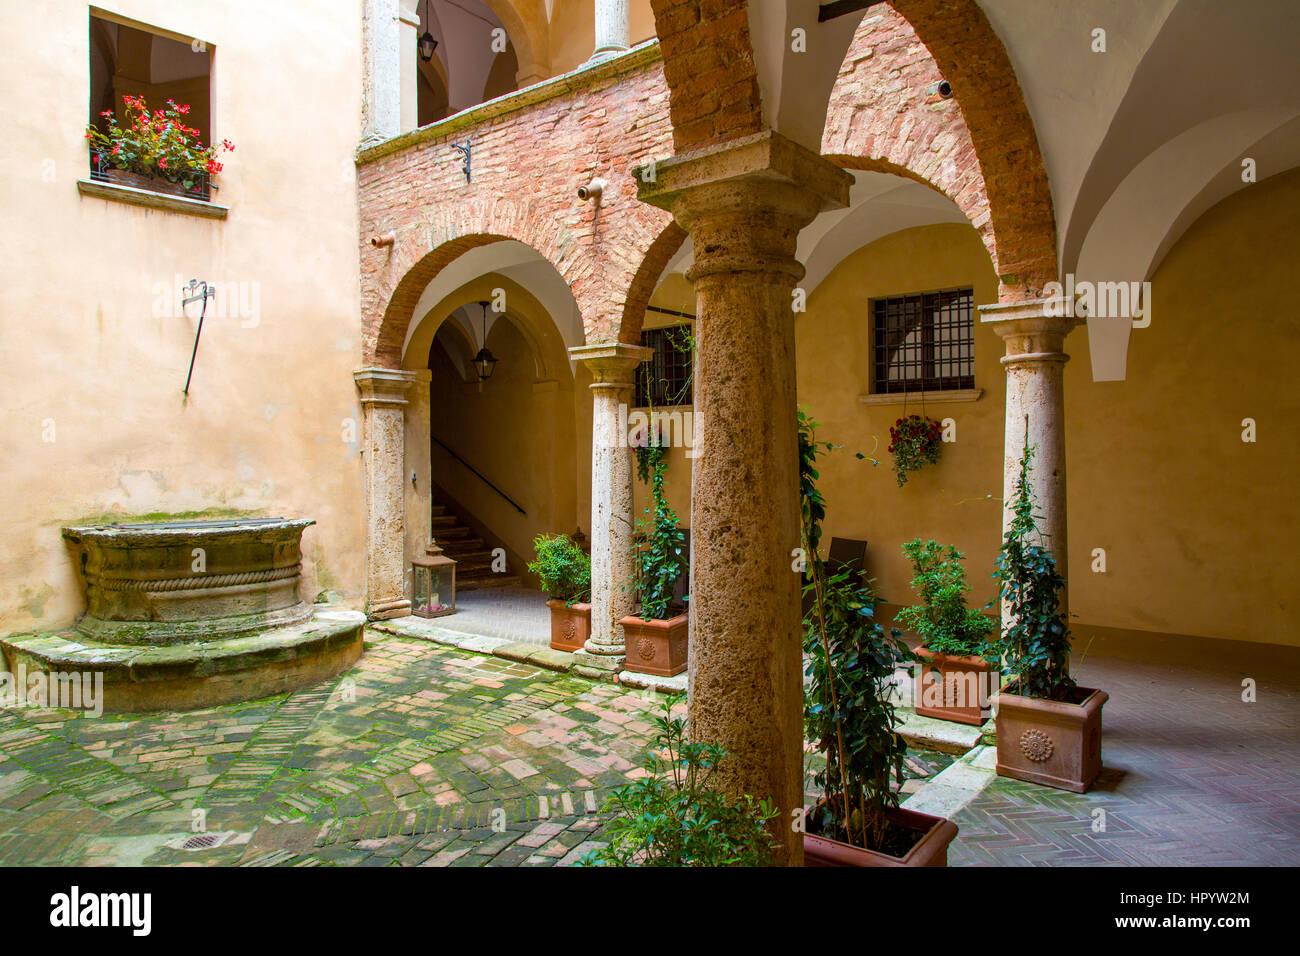 Innenhof und Brunnen, Montepulciano, Toskana, Italien Stockbild